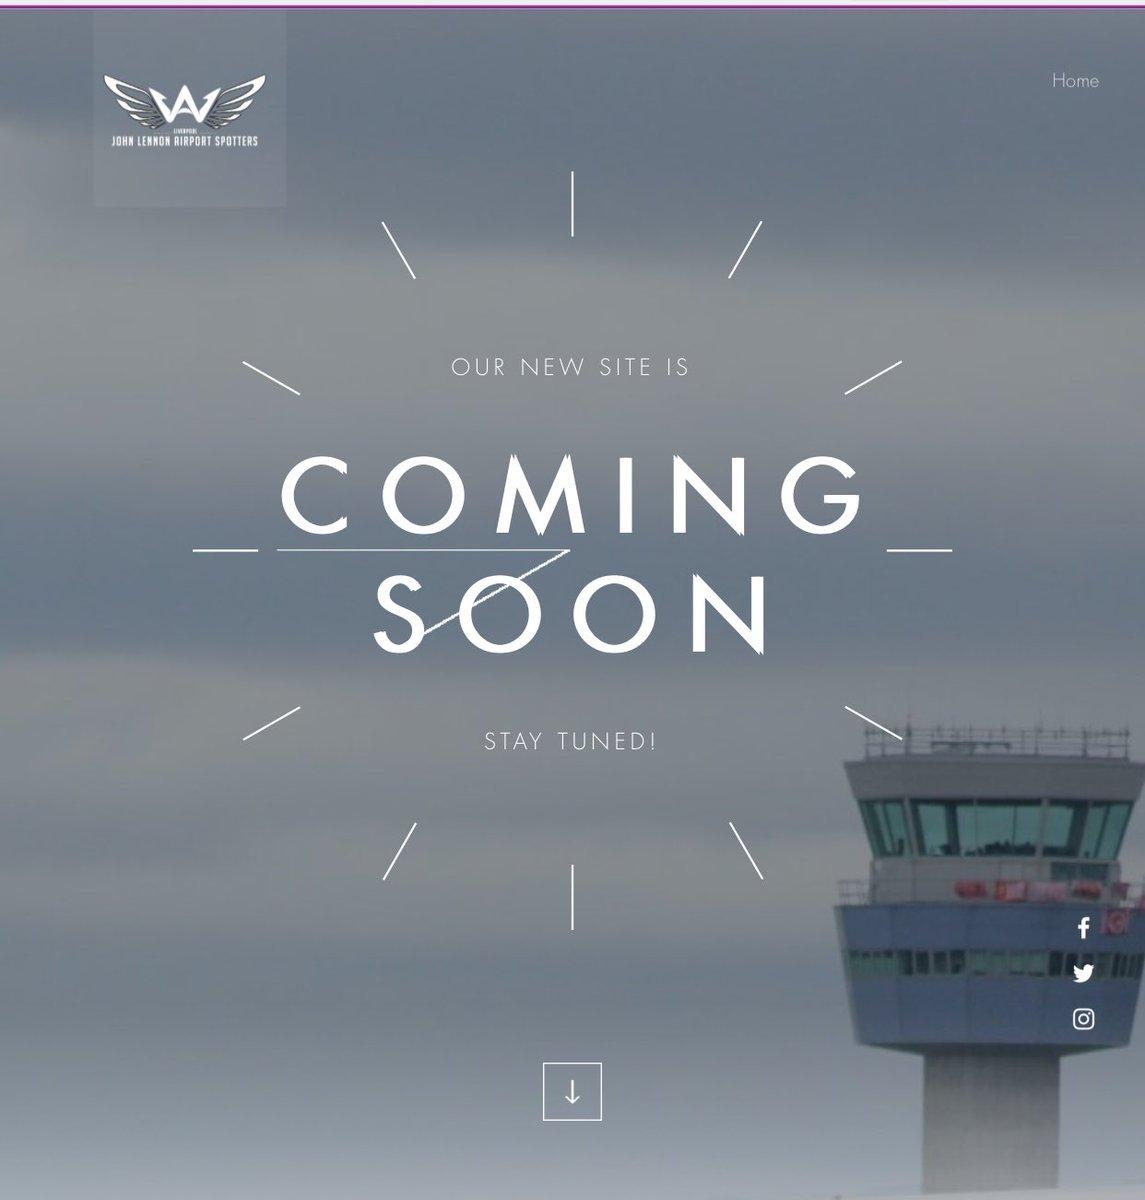 New Website Coming Soon ✈️😁               https://t.co/osgbD9UYTm https://t.co/RzMugB13qb